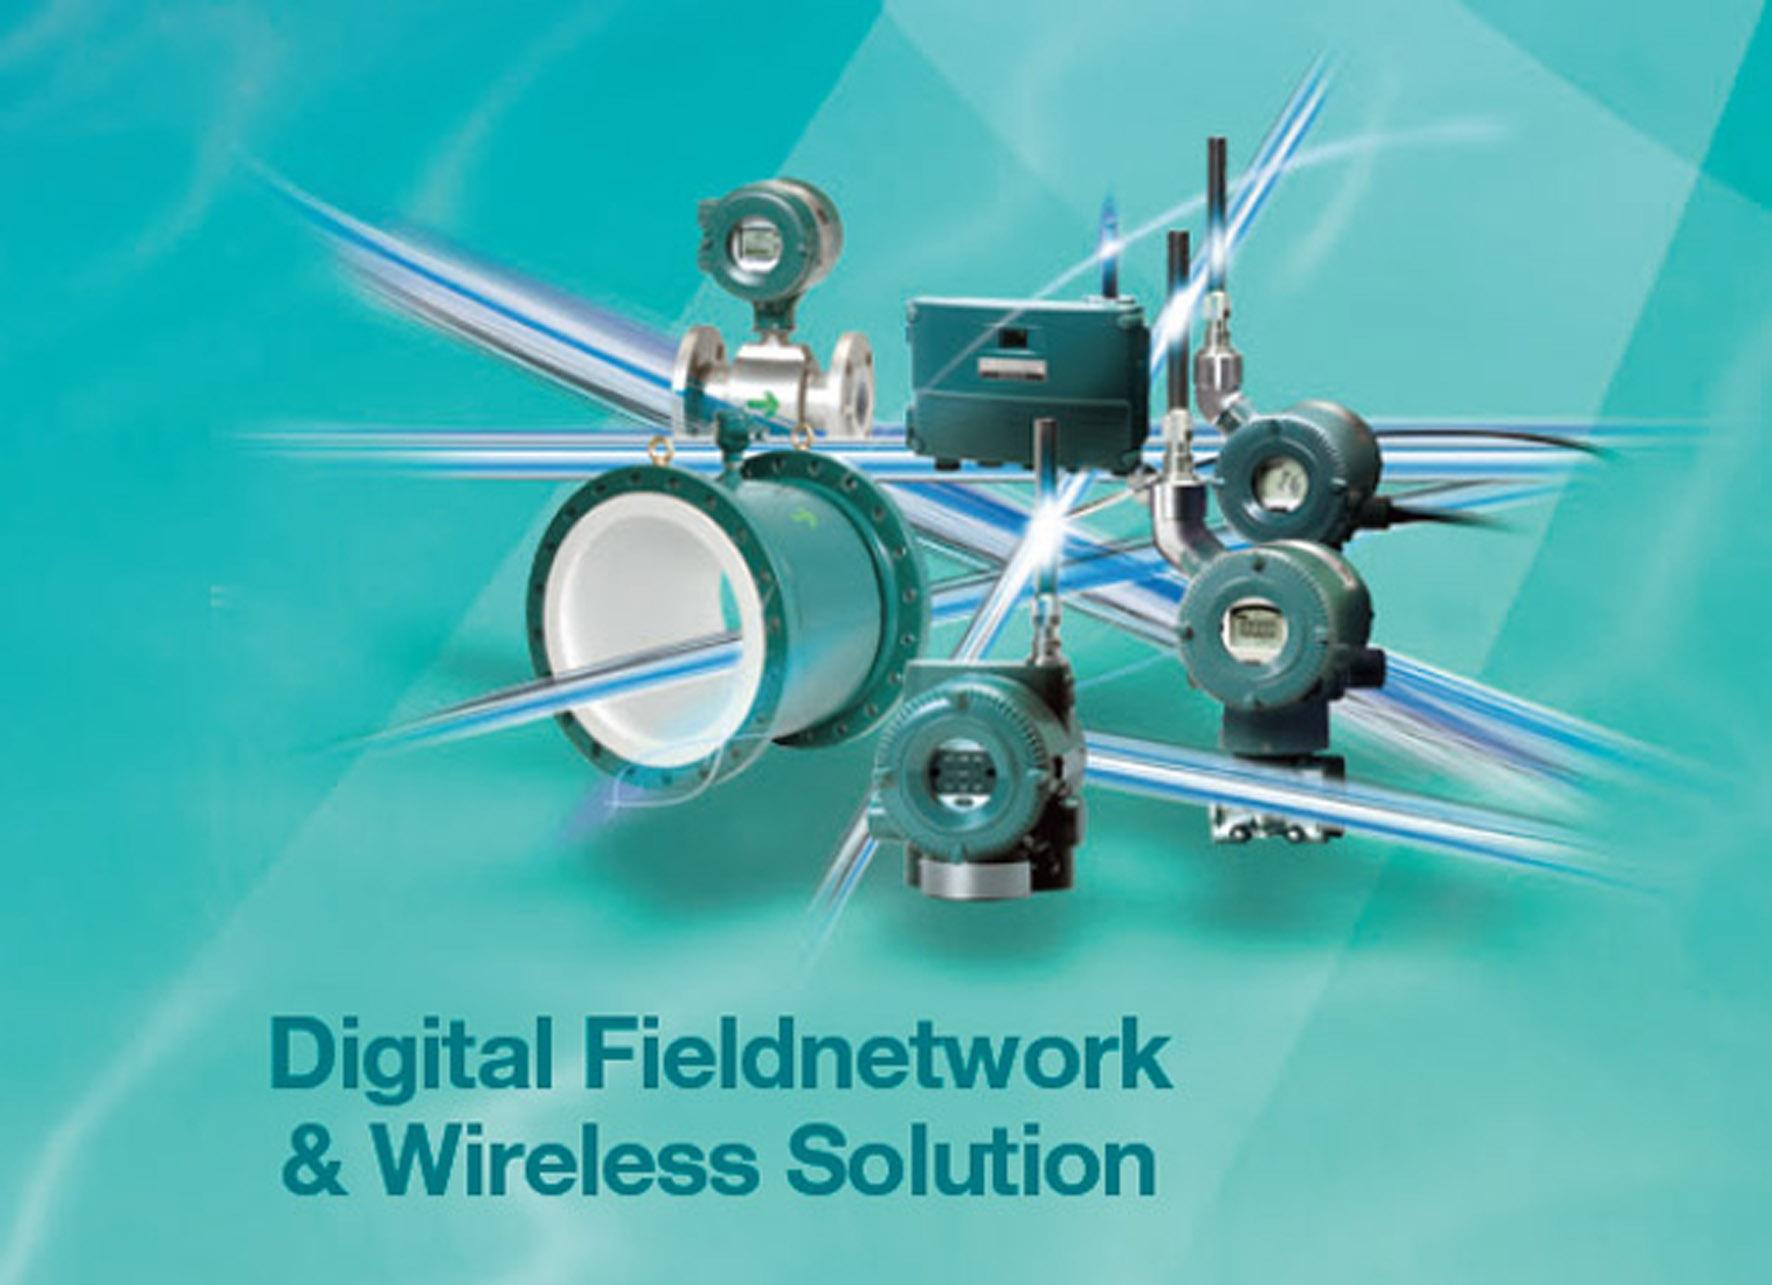 Digital Fieldnetwork & Wireless Solution